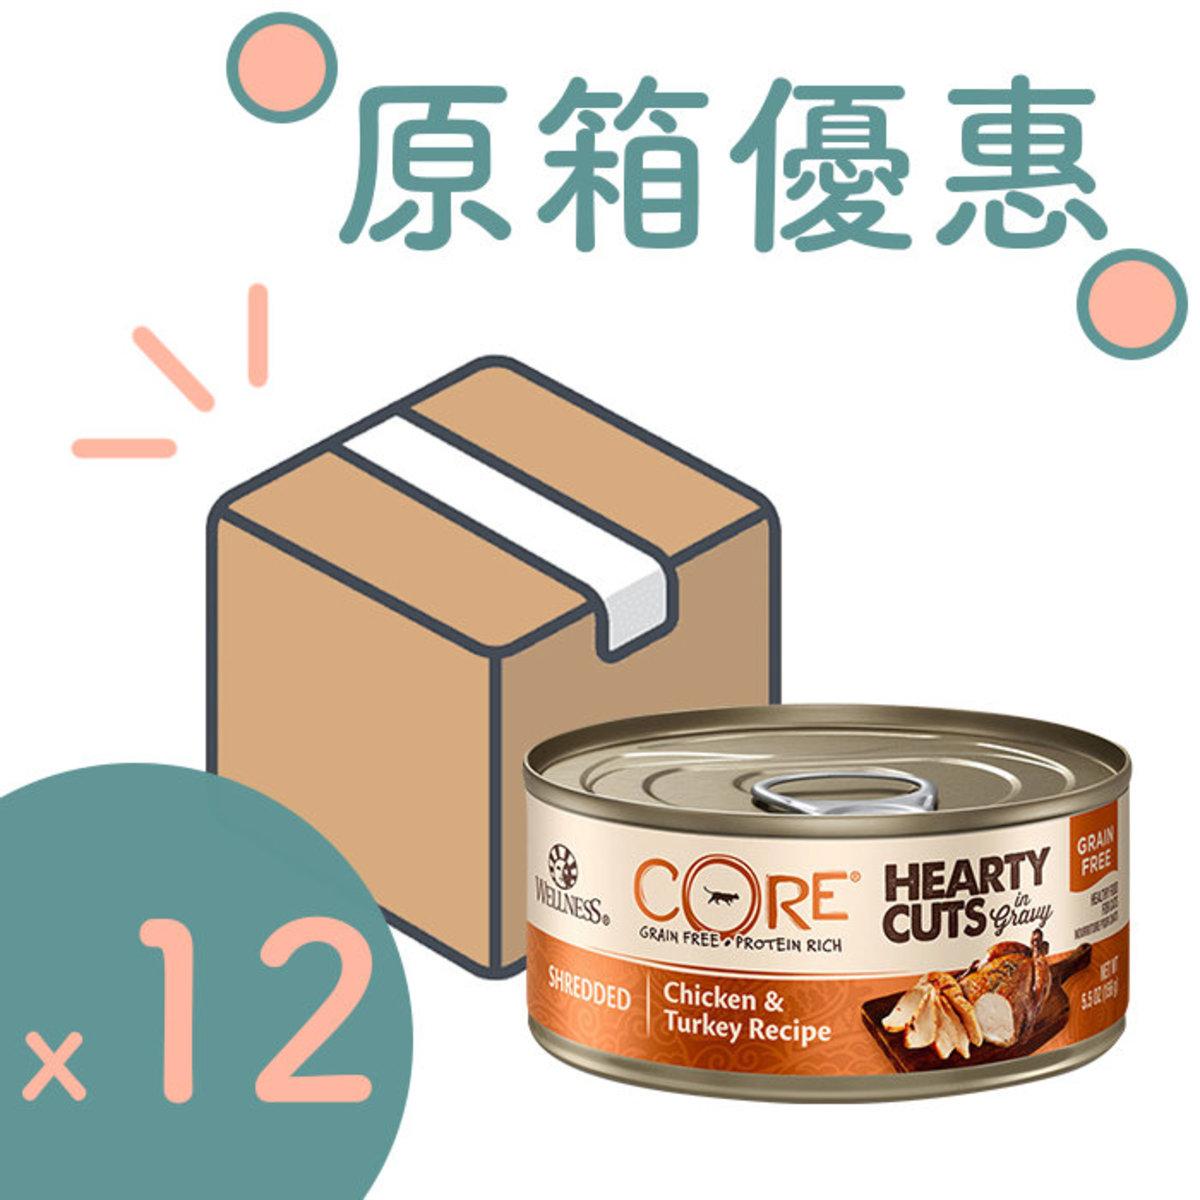 [12PCS SET] Hearty Cuts Grain Free Shredded Chicken & Turkey Recipe Cat Canned 5.5oz